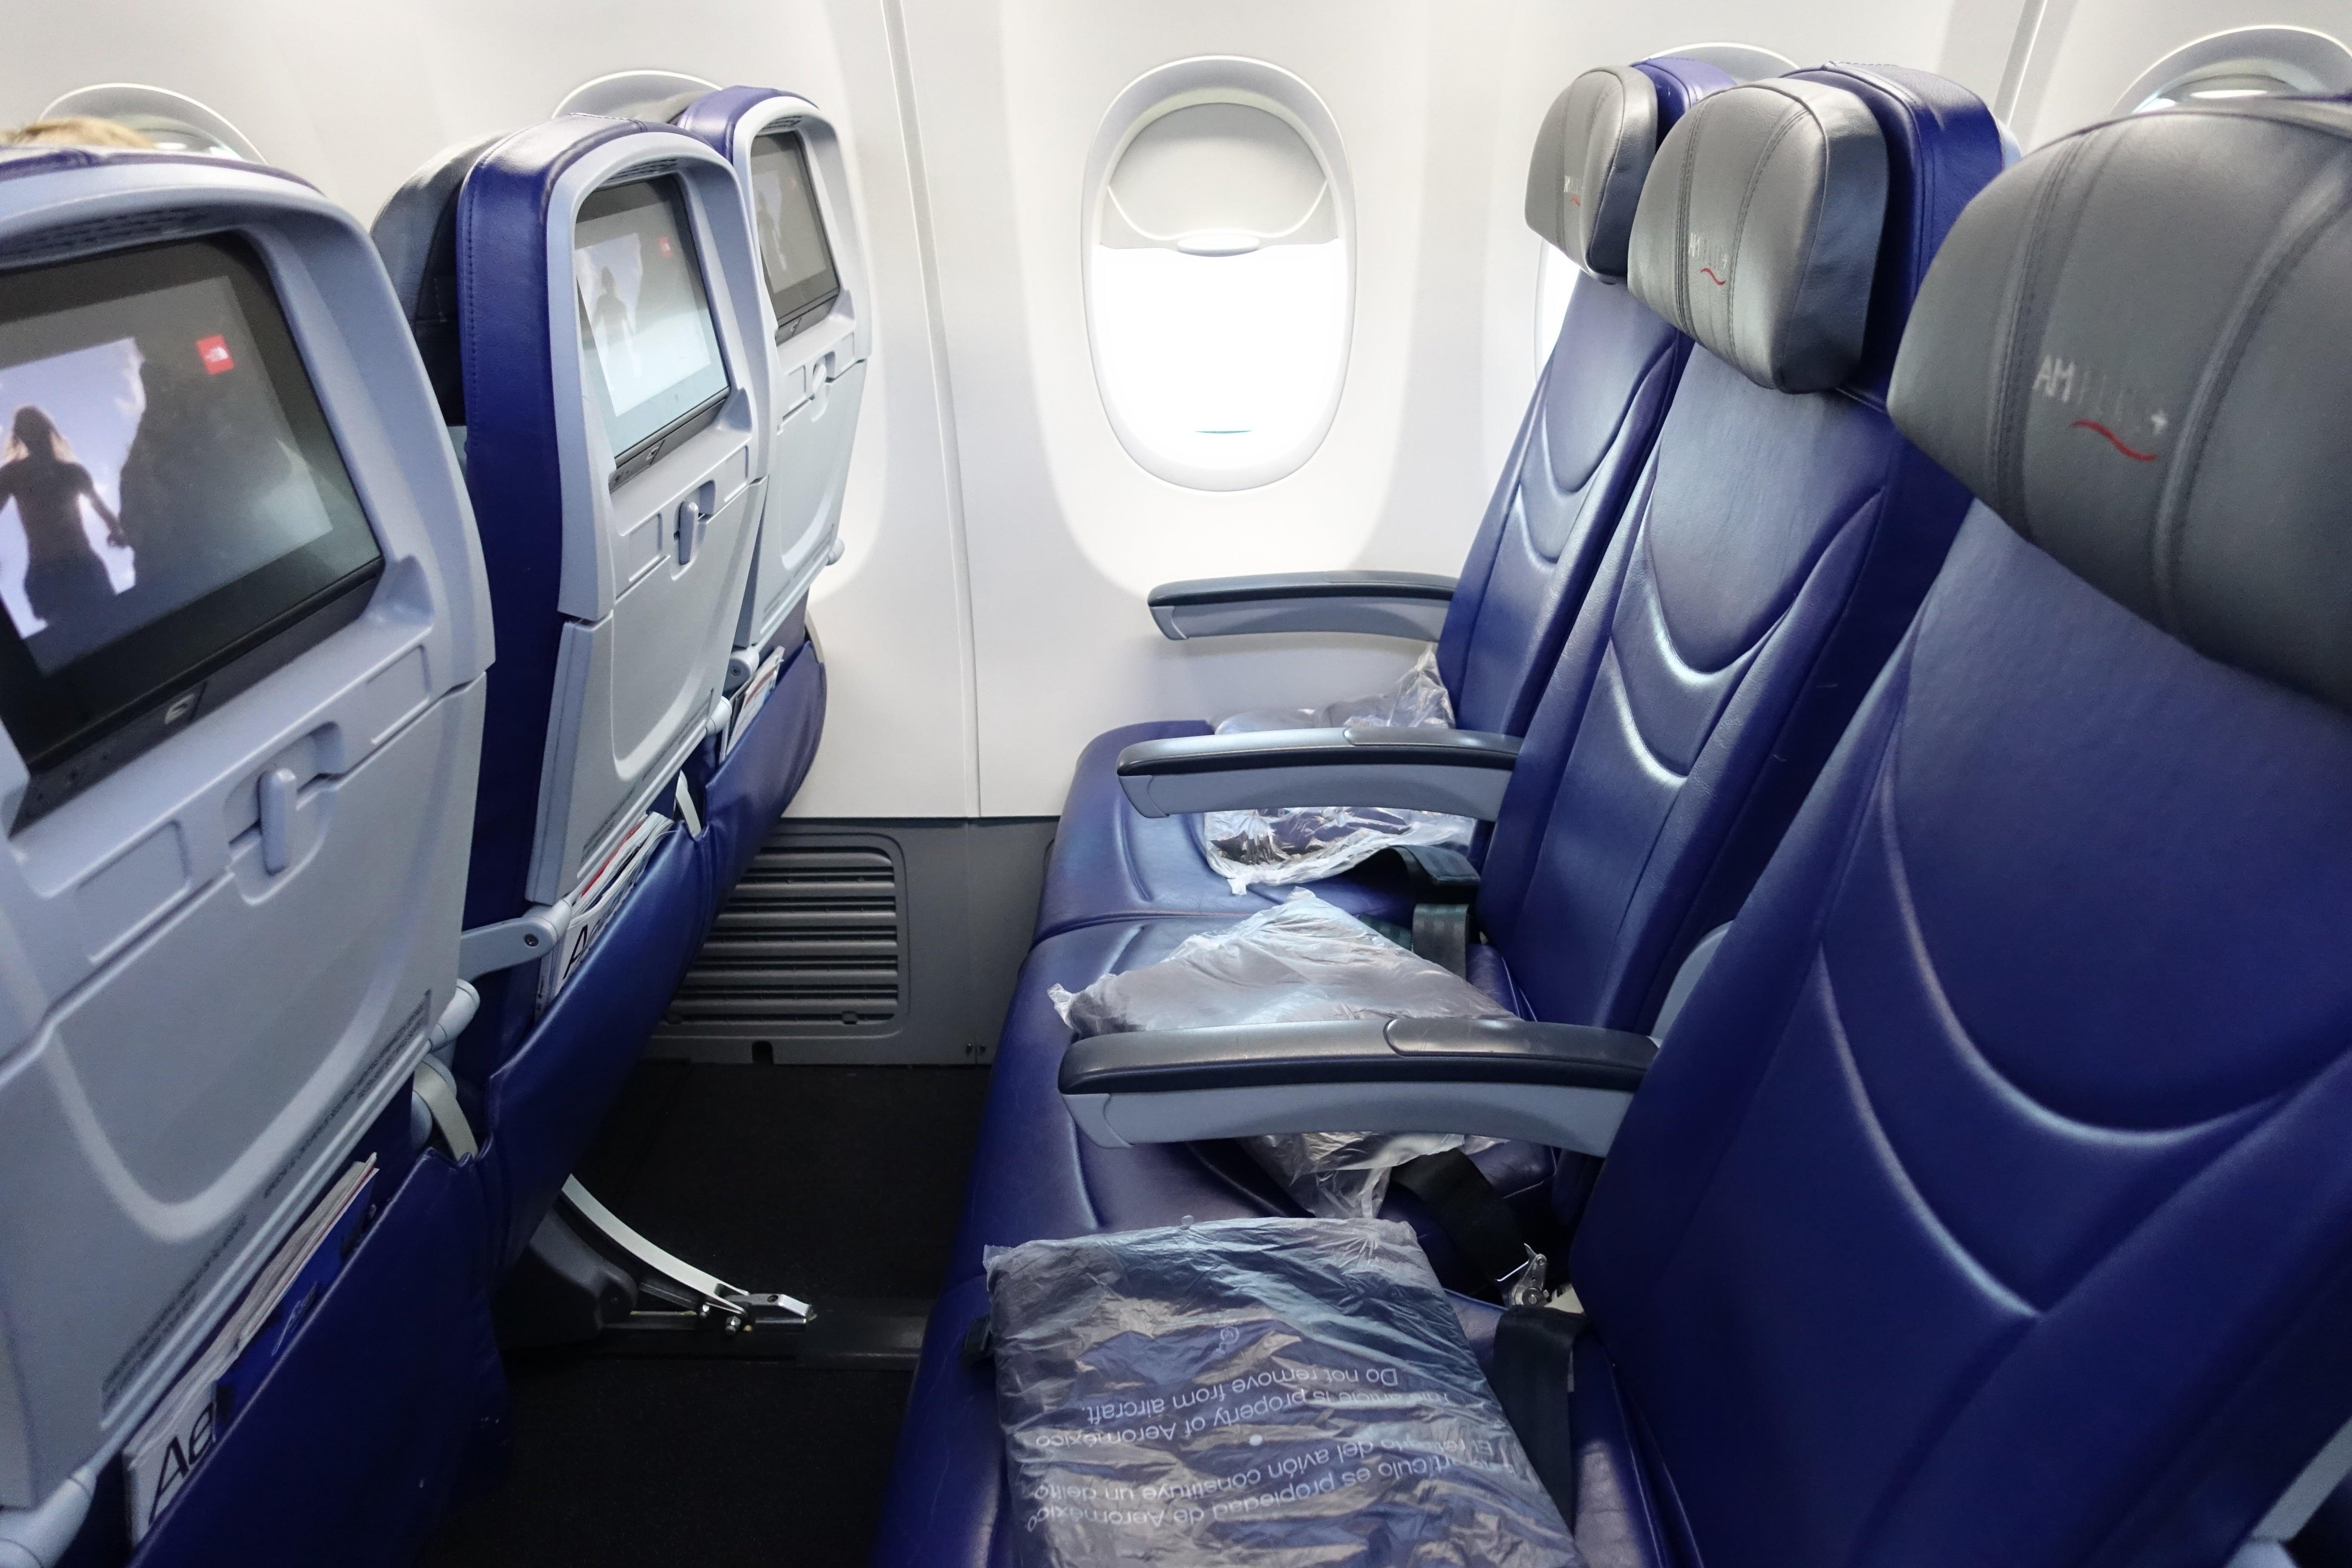 Review Aeromexico 737 800 Economy New York To Cancun